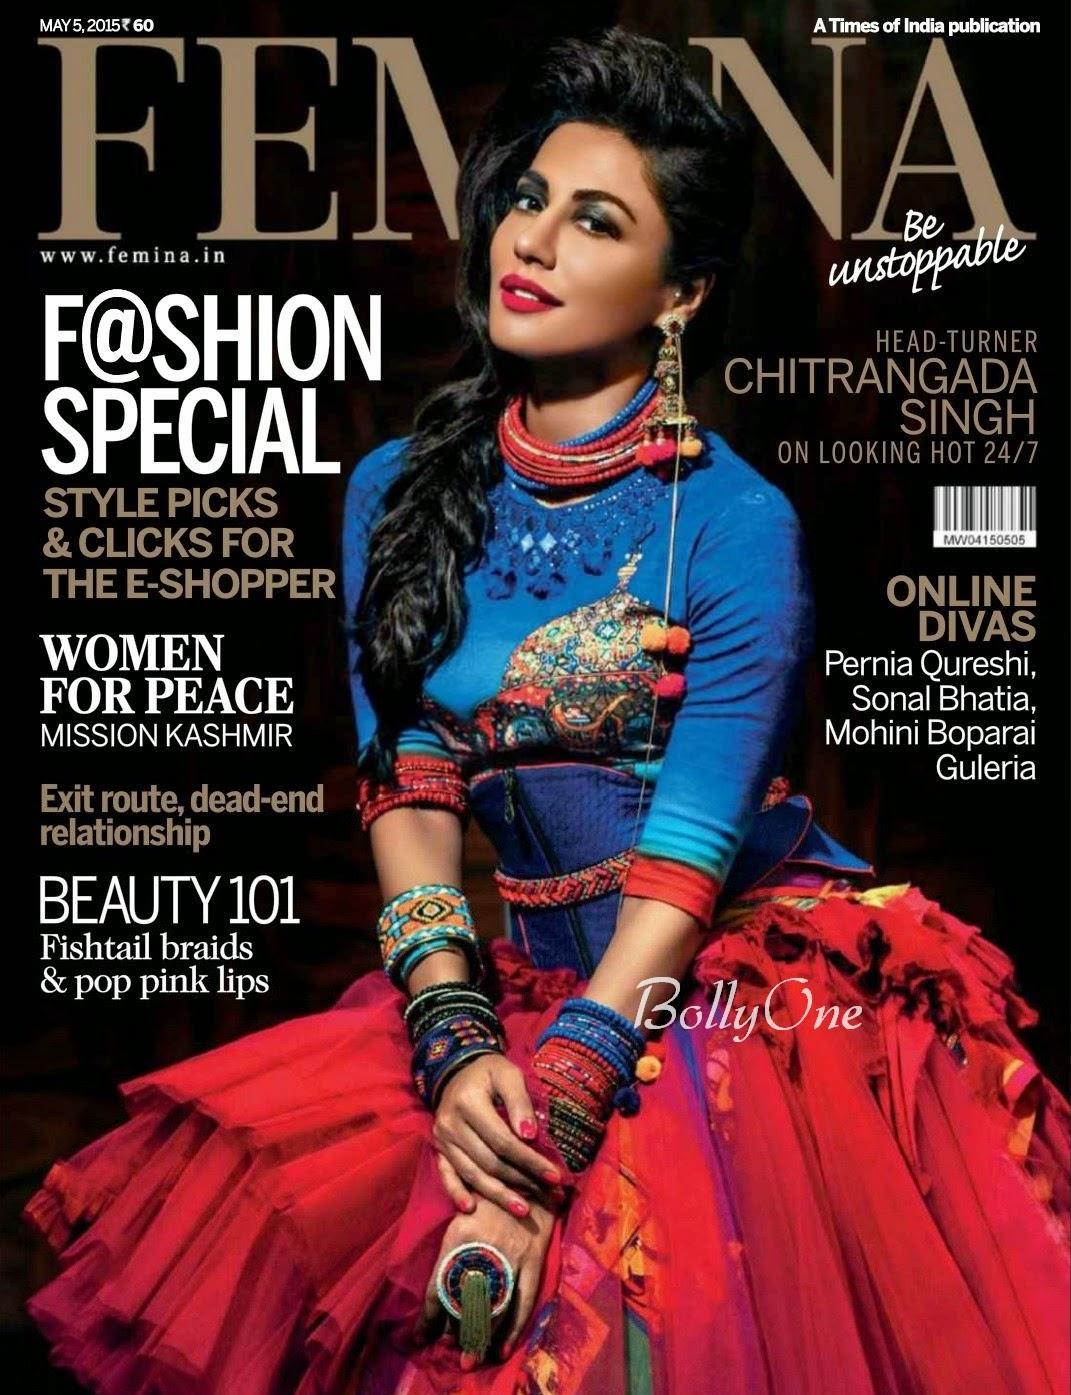 Actress @ Chitrangada Singh - Femina Magazine May 2015